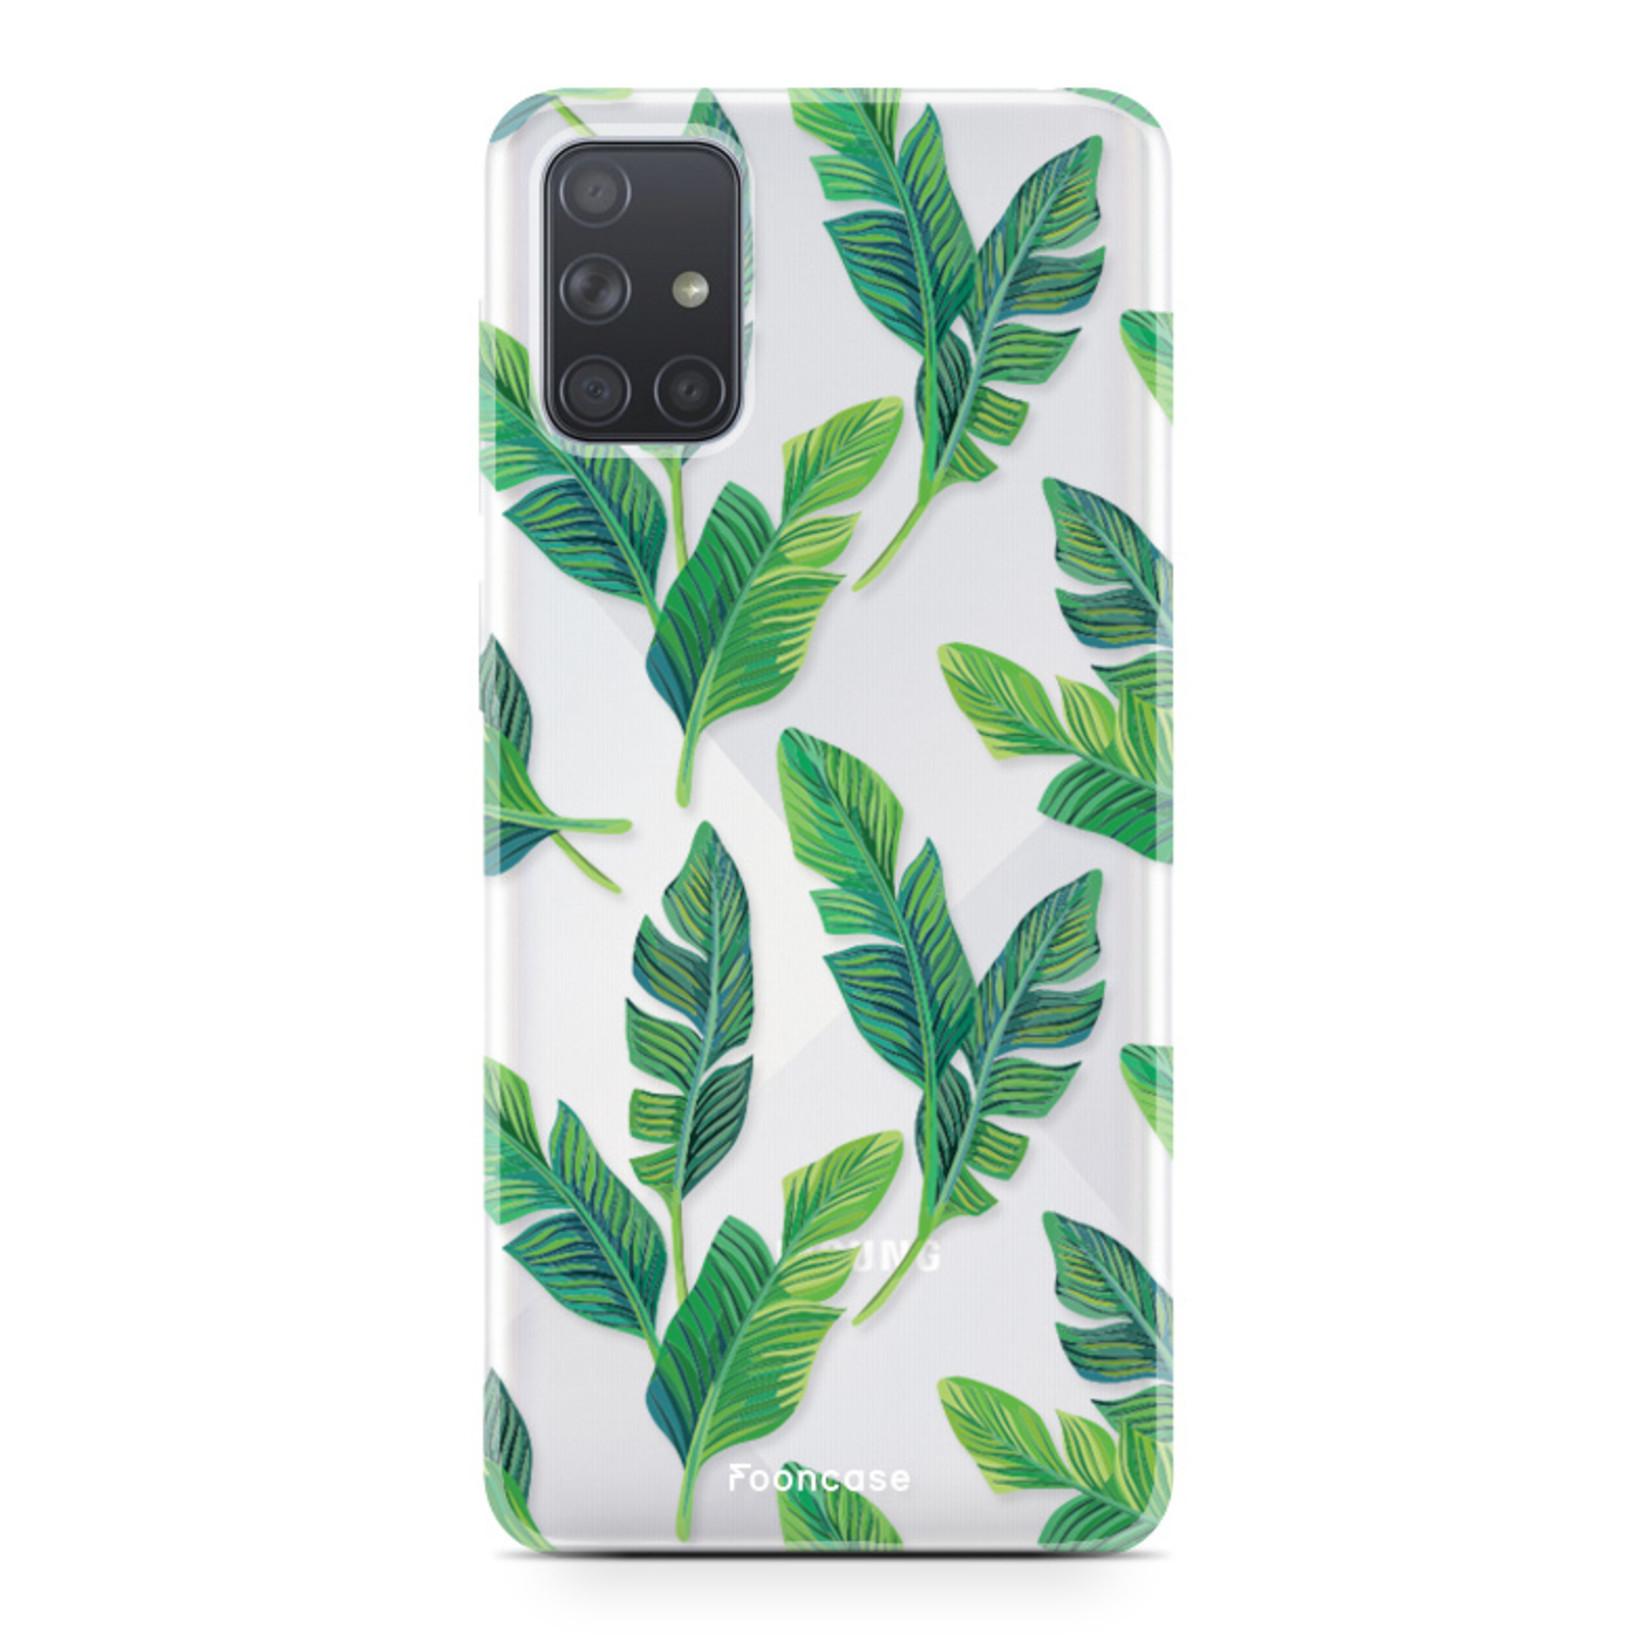 Samsung Galaxy A71 hoesje TPU Soft Case - Back Cover - Banana leaves / Bananen bladeren